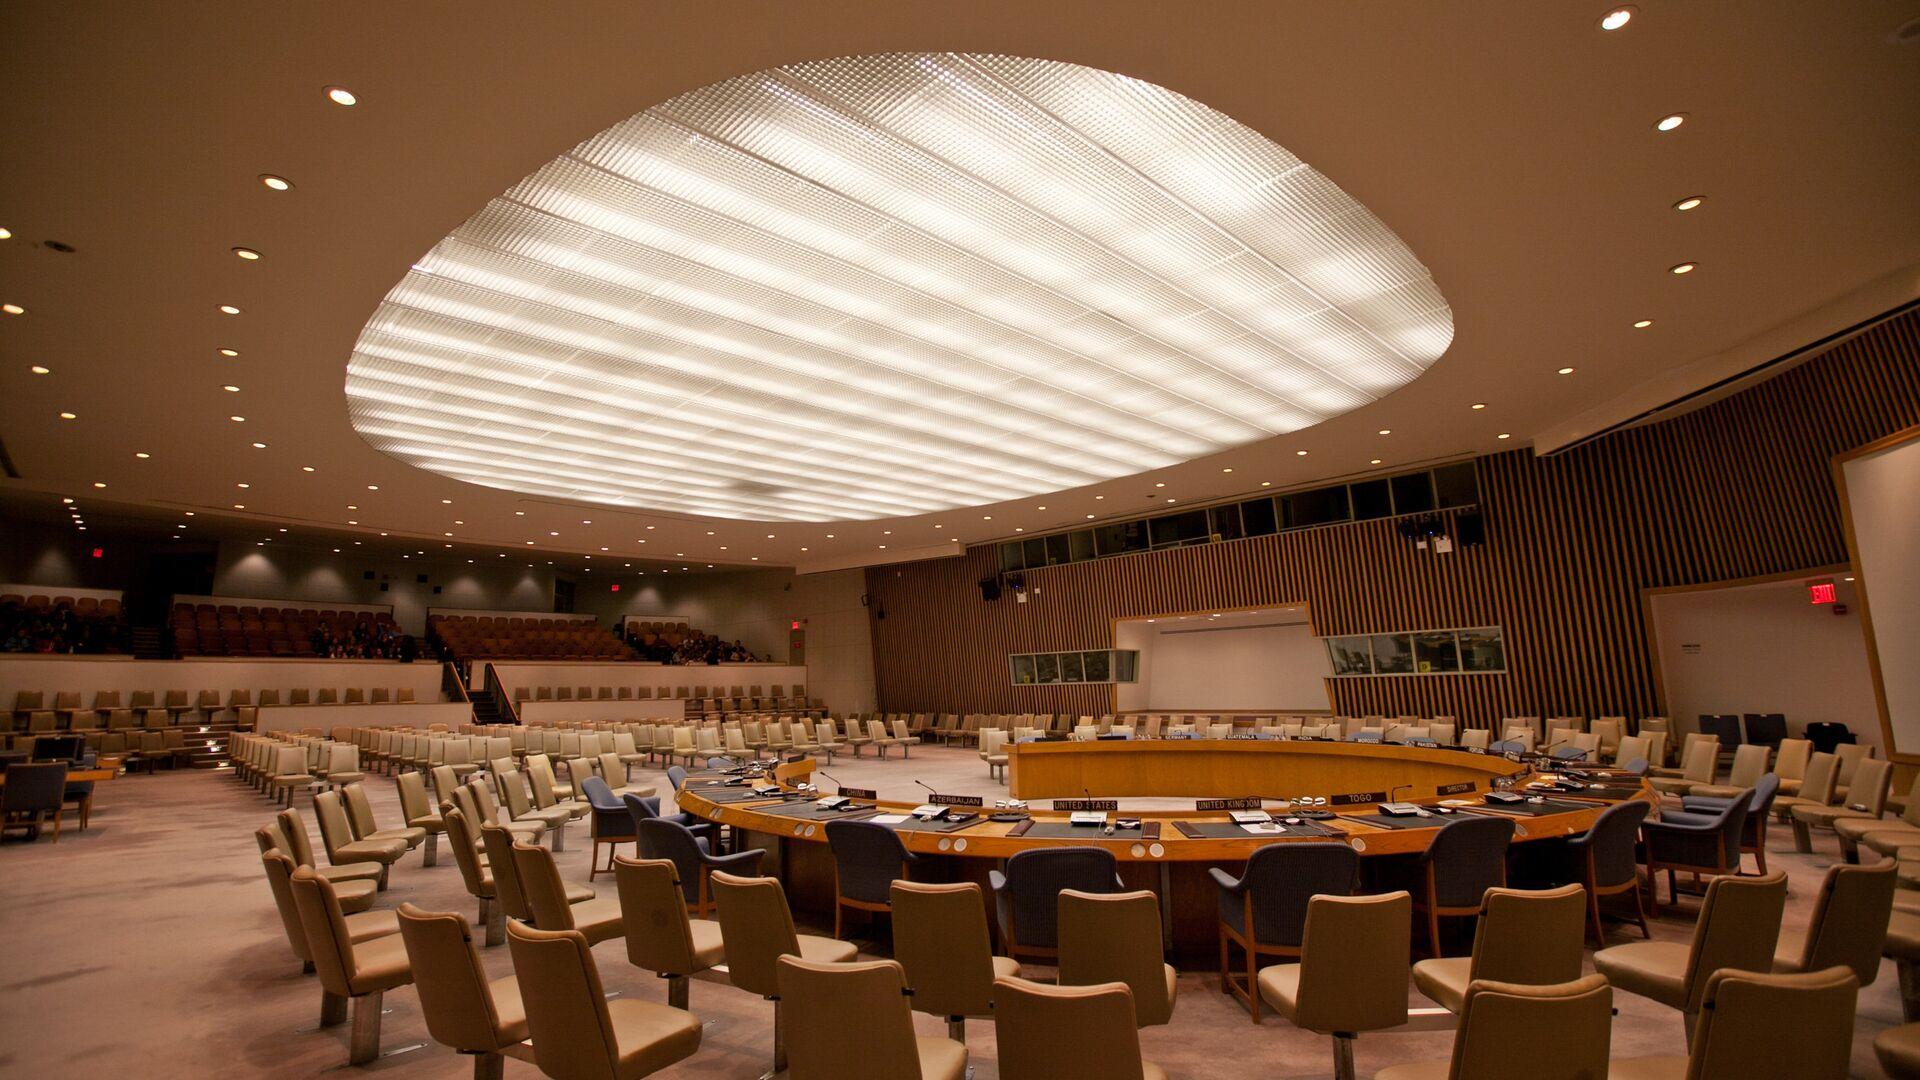 UN Security Council chamber (File photo). - Sputnik International, 1920, 17.09.2021